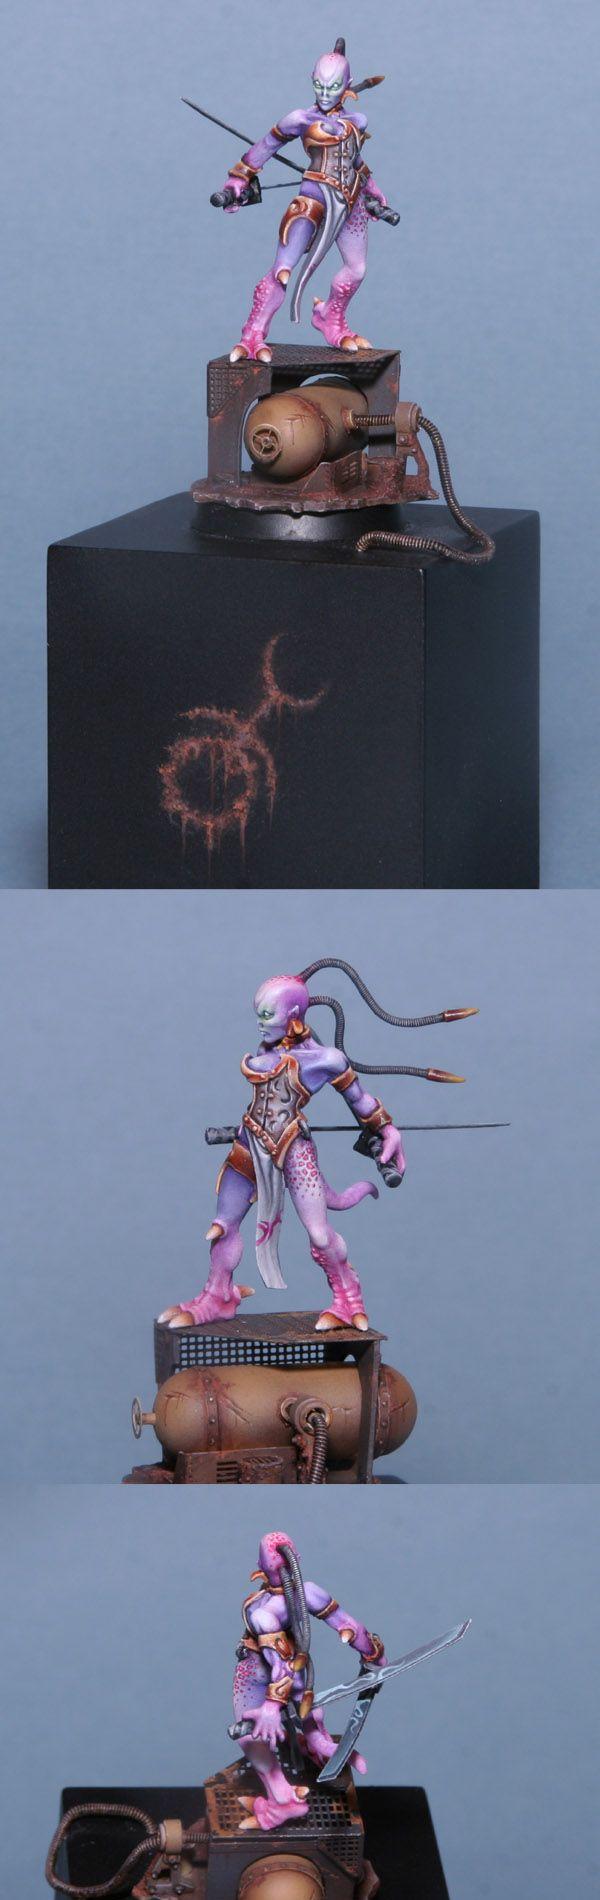 U.K. 2008 - Figurine Individuelle Warhammer 40,000 - Demon Winner, le site non officiel du Golden Demon